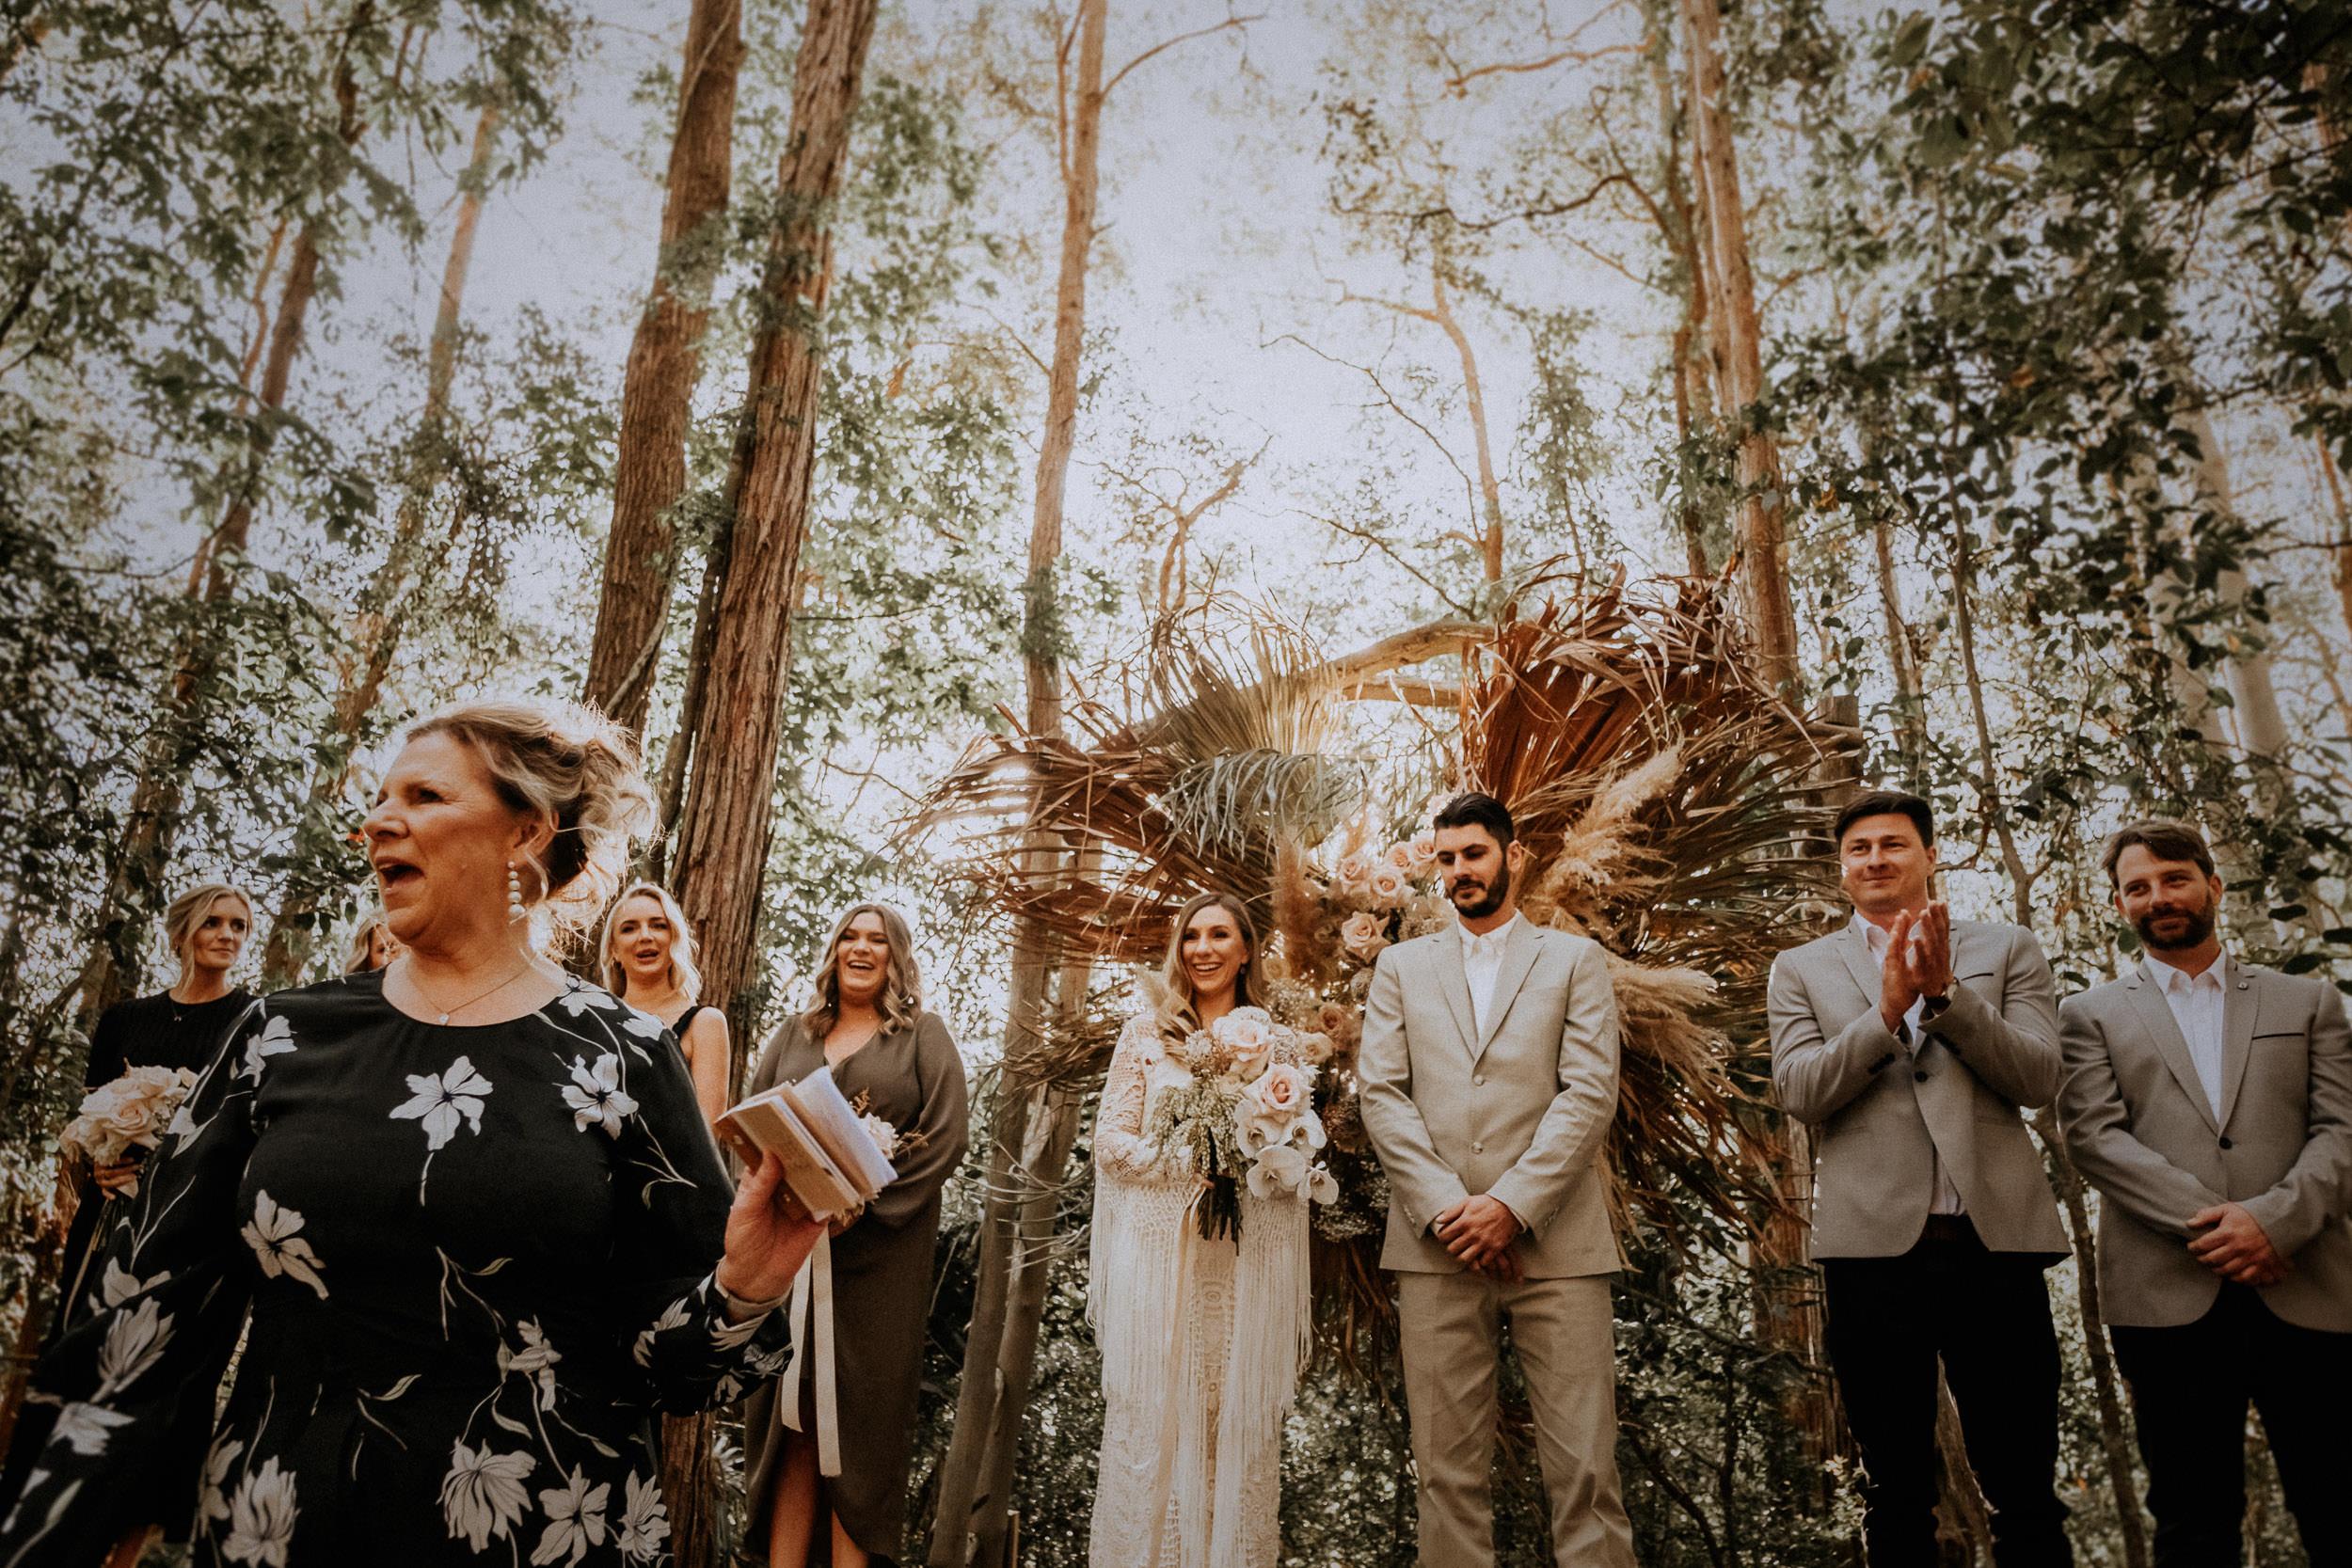 S&A Elopement - Kings & Thieves - Shred 'Til Dead - Central Coast Beach Forest Wedding - 200.jpg